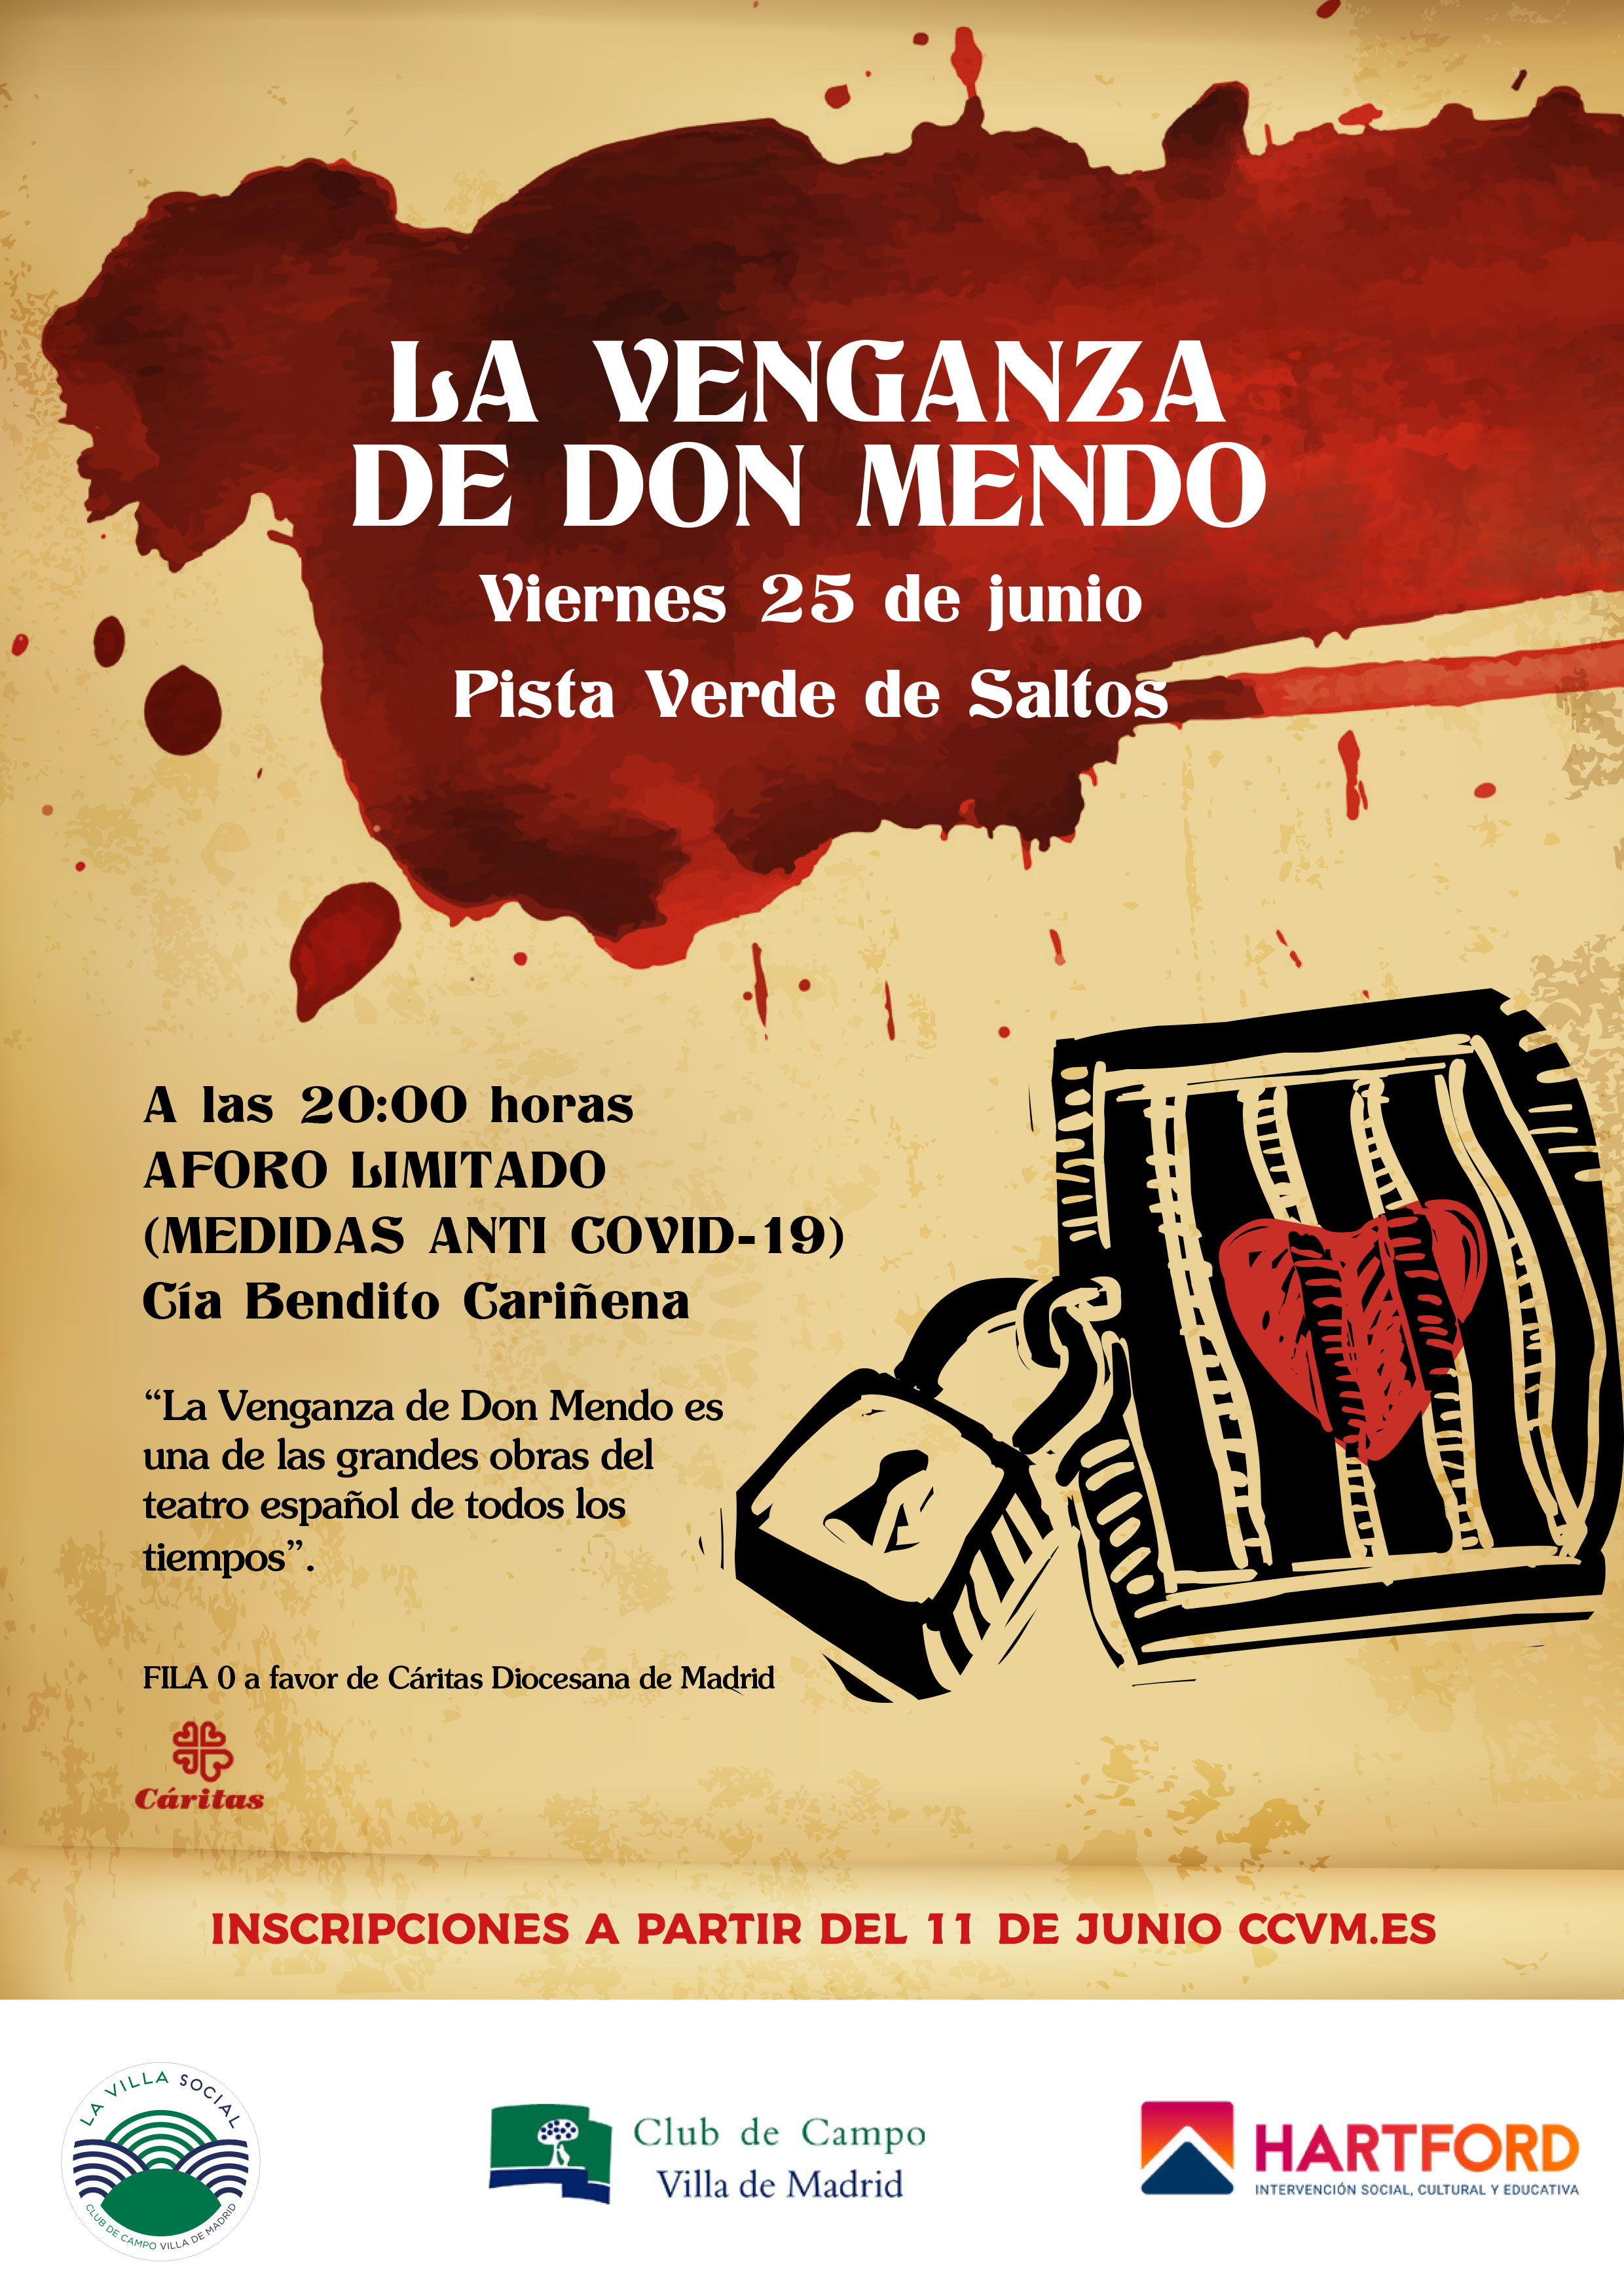 La venganza de Don Mendo.